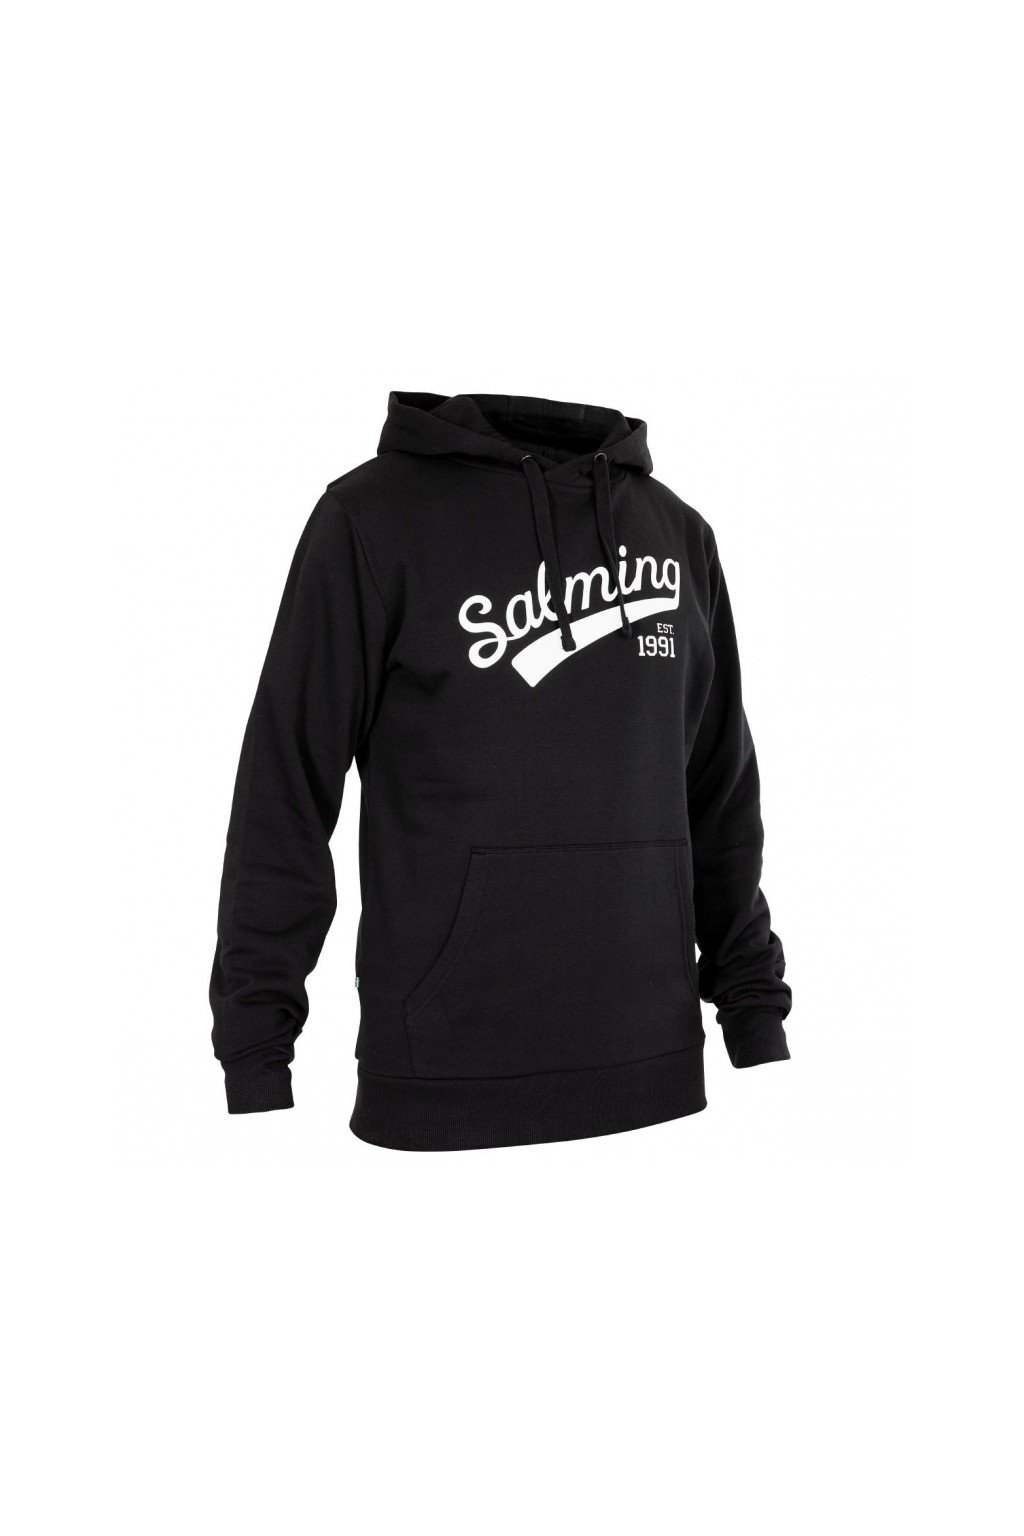 salming logo hood jr black 164